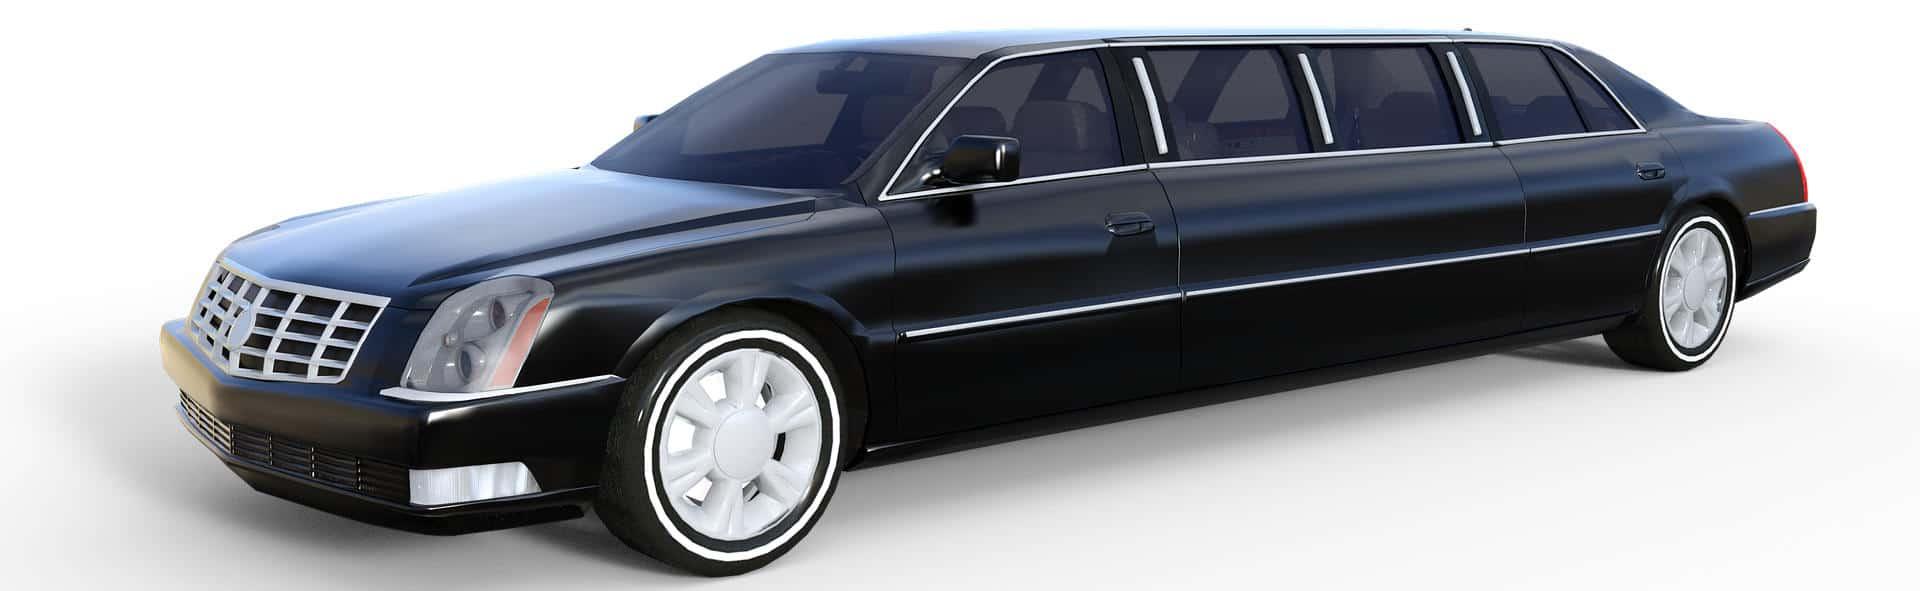 wilmington-nc-limousines